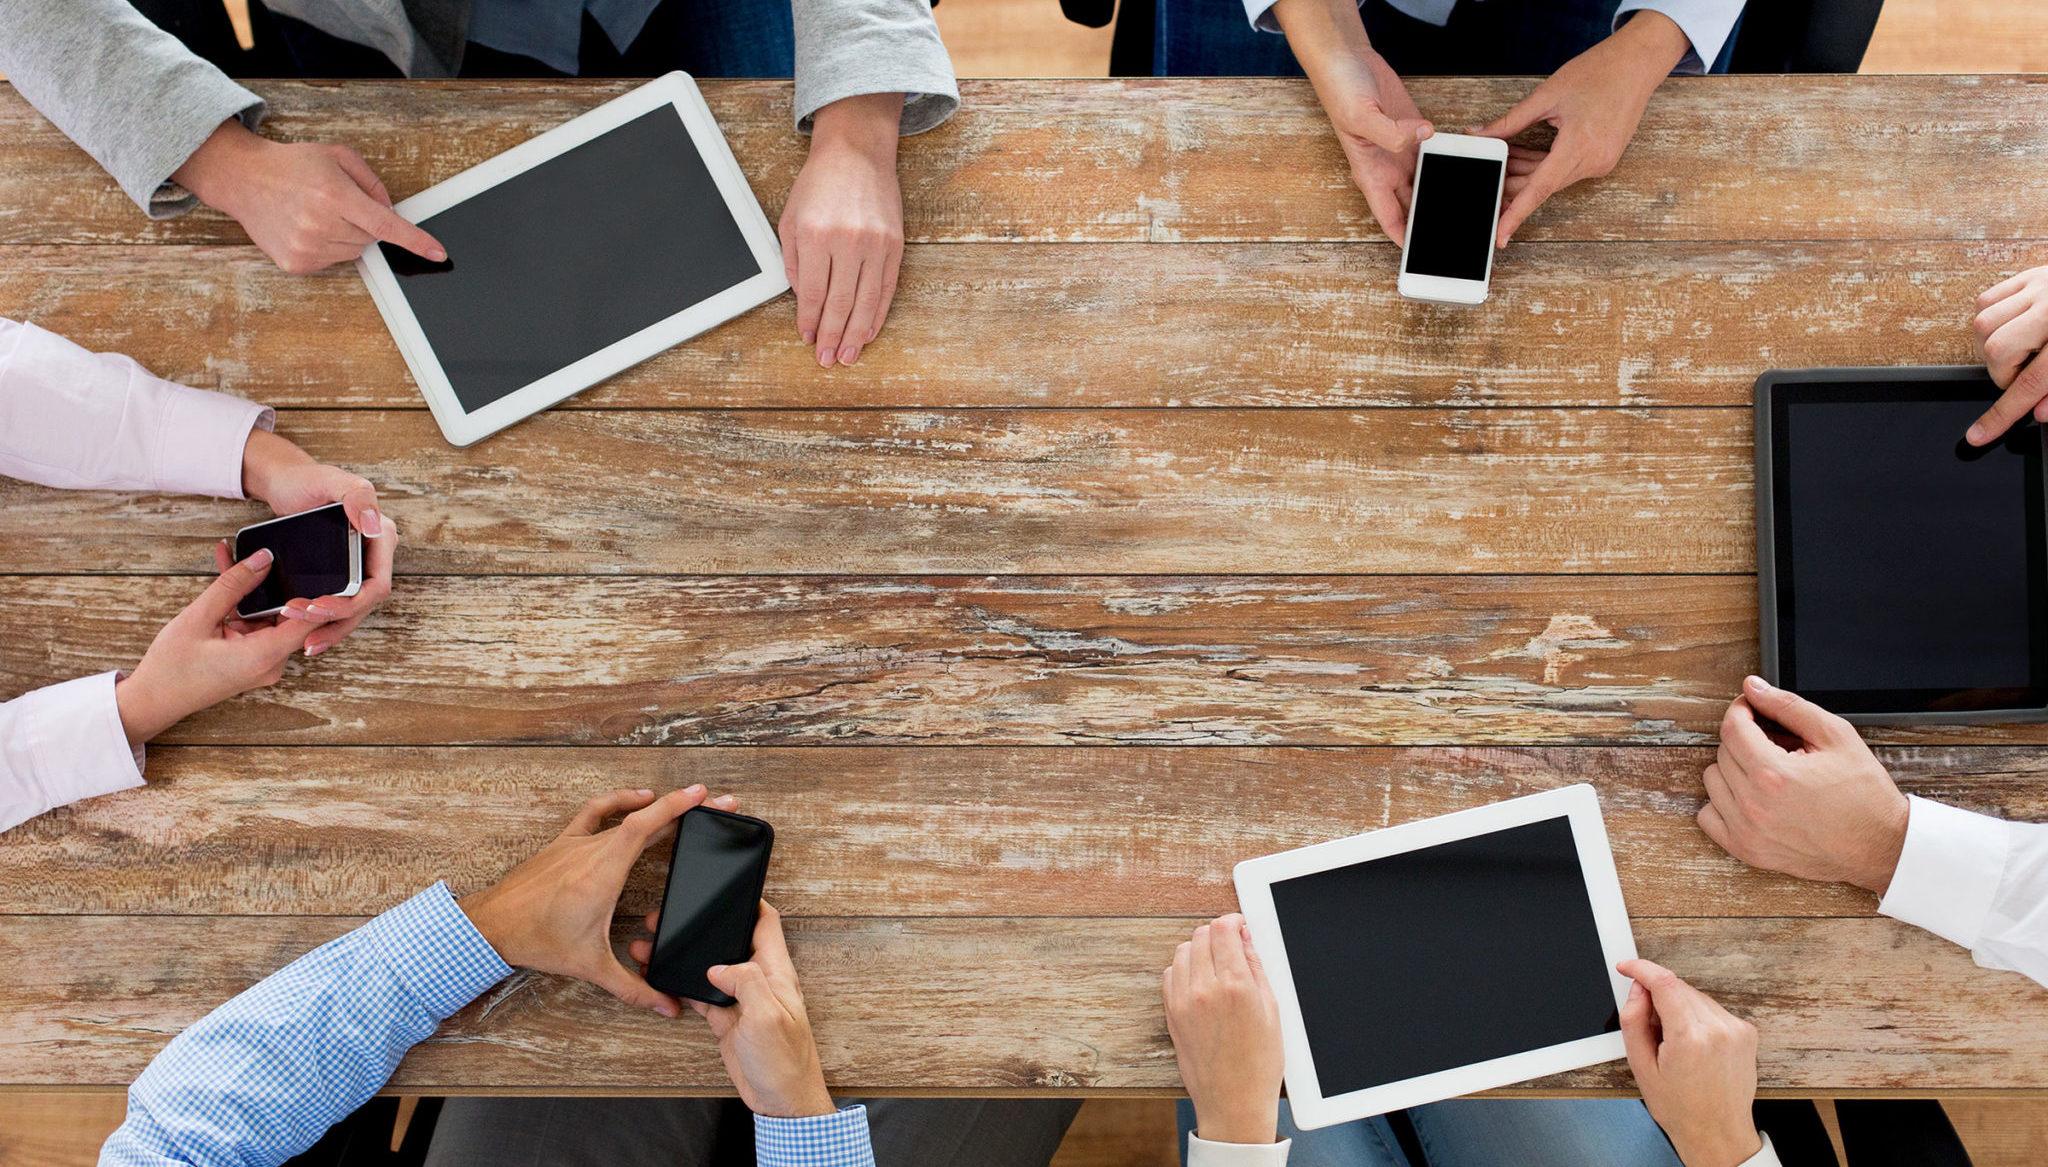 mobile team meeting